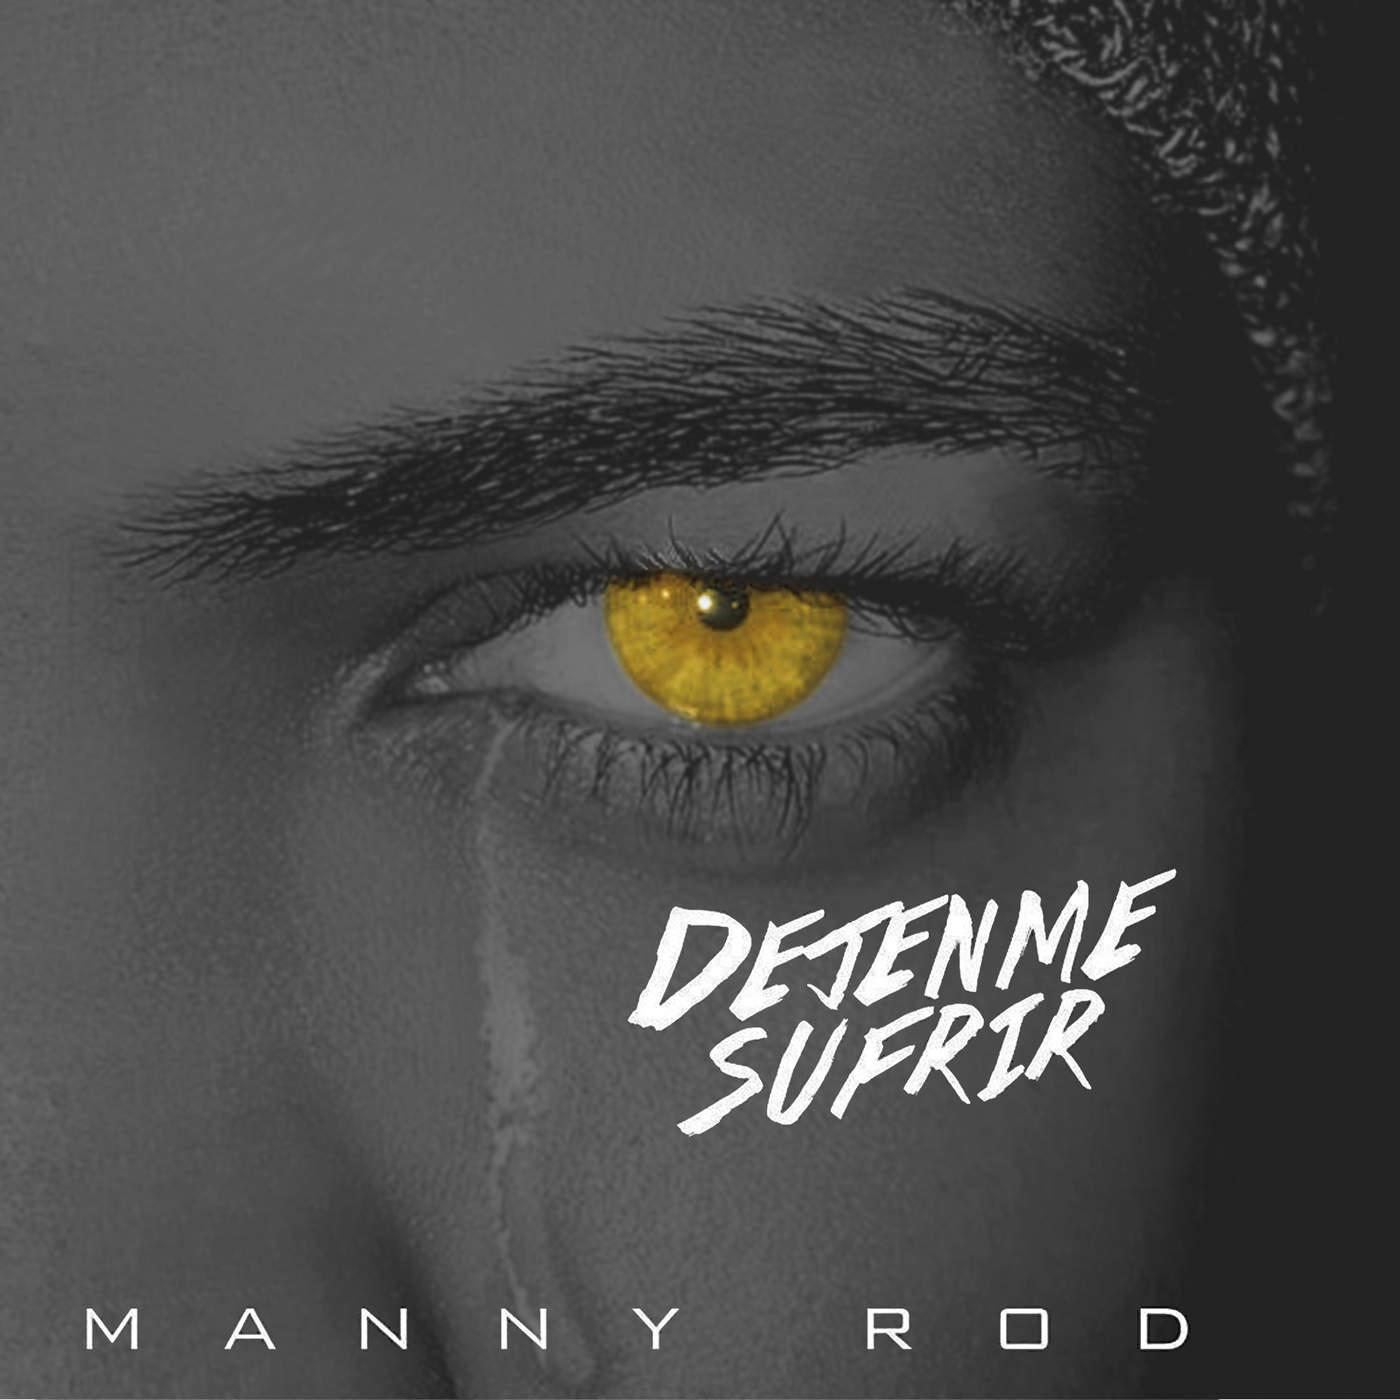 DEJENME SUFRIR - MY DESTINY